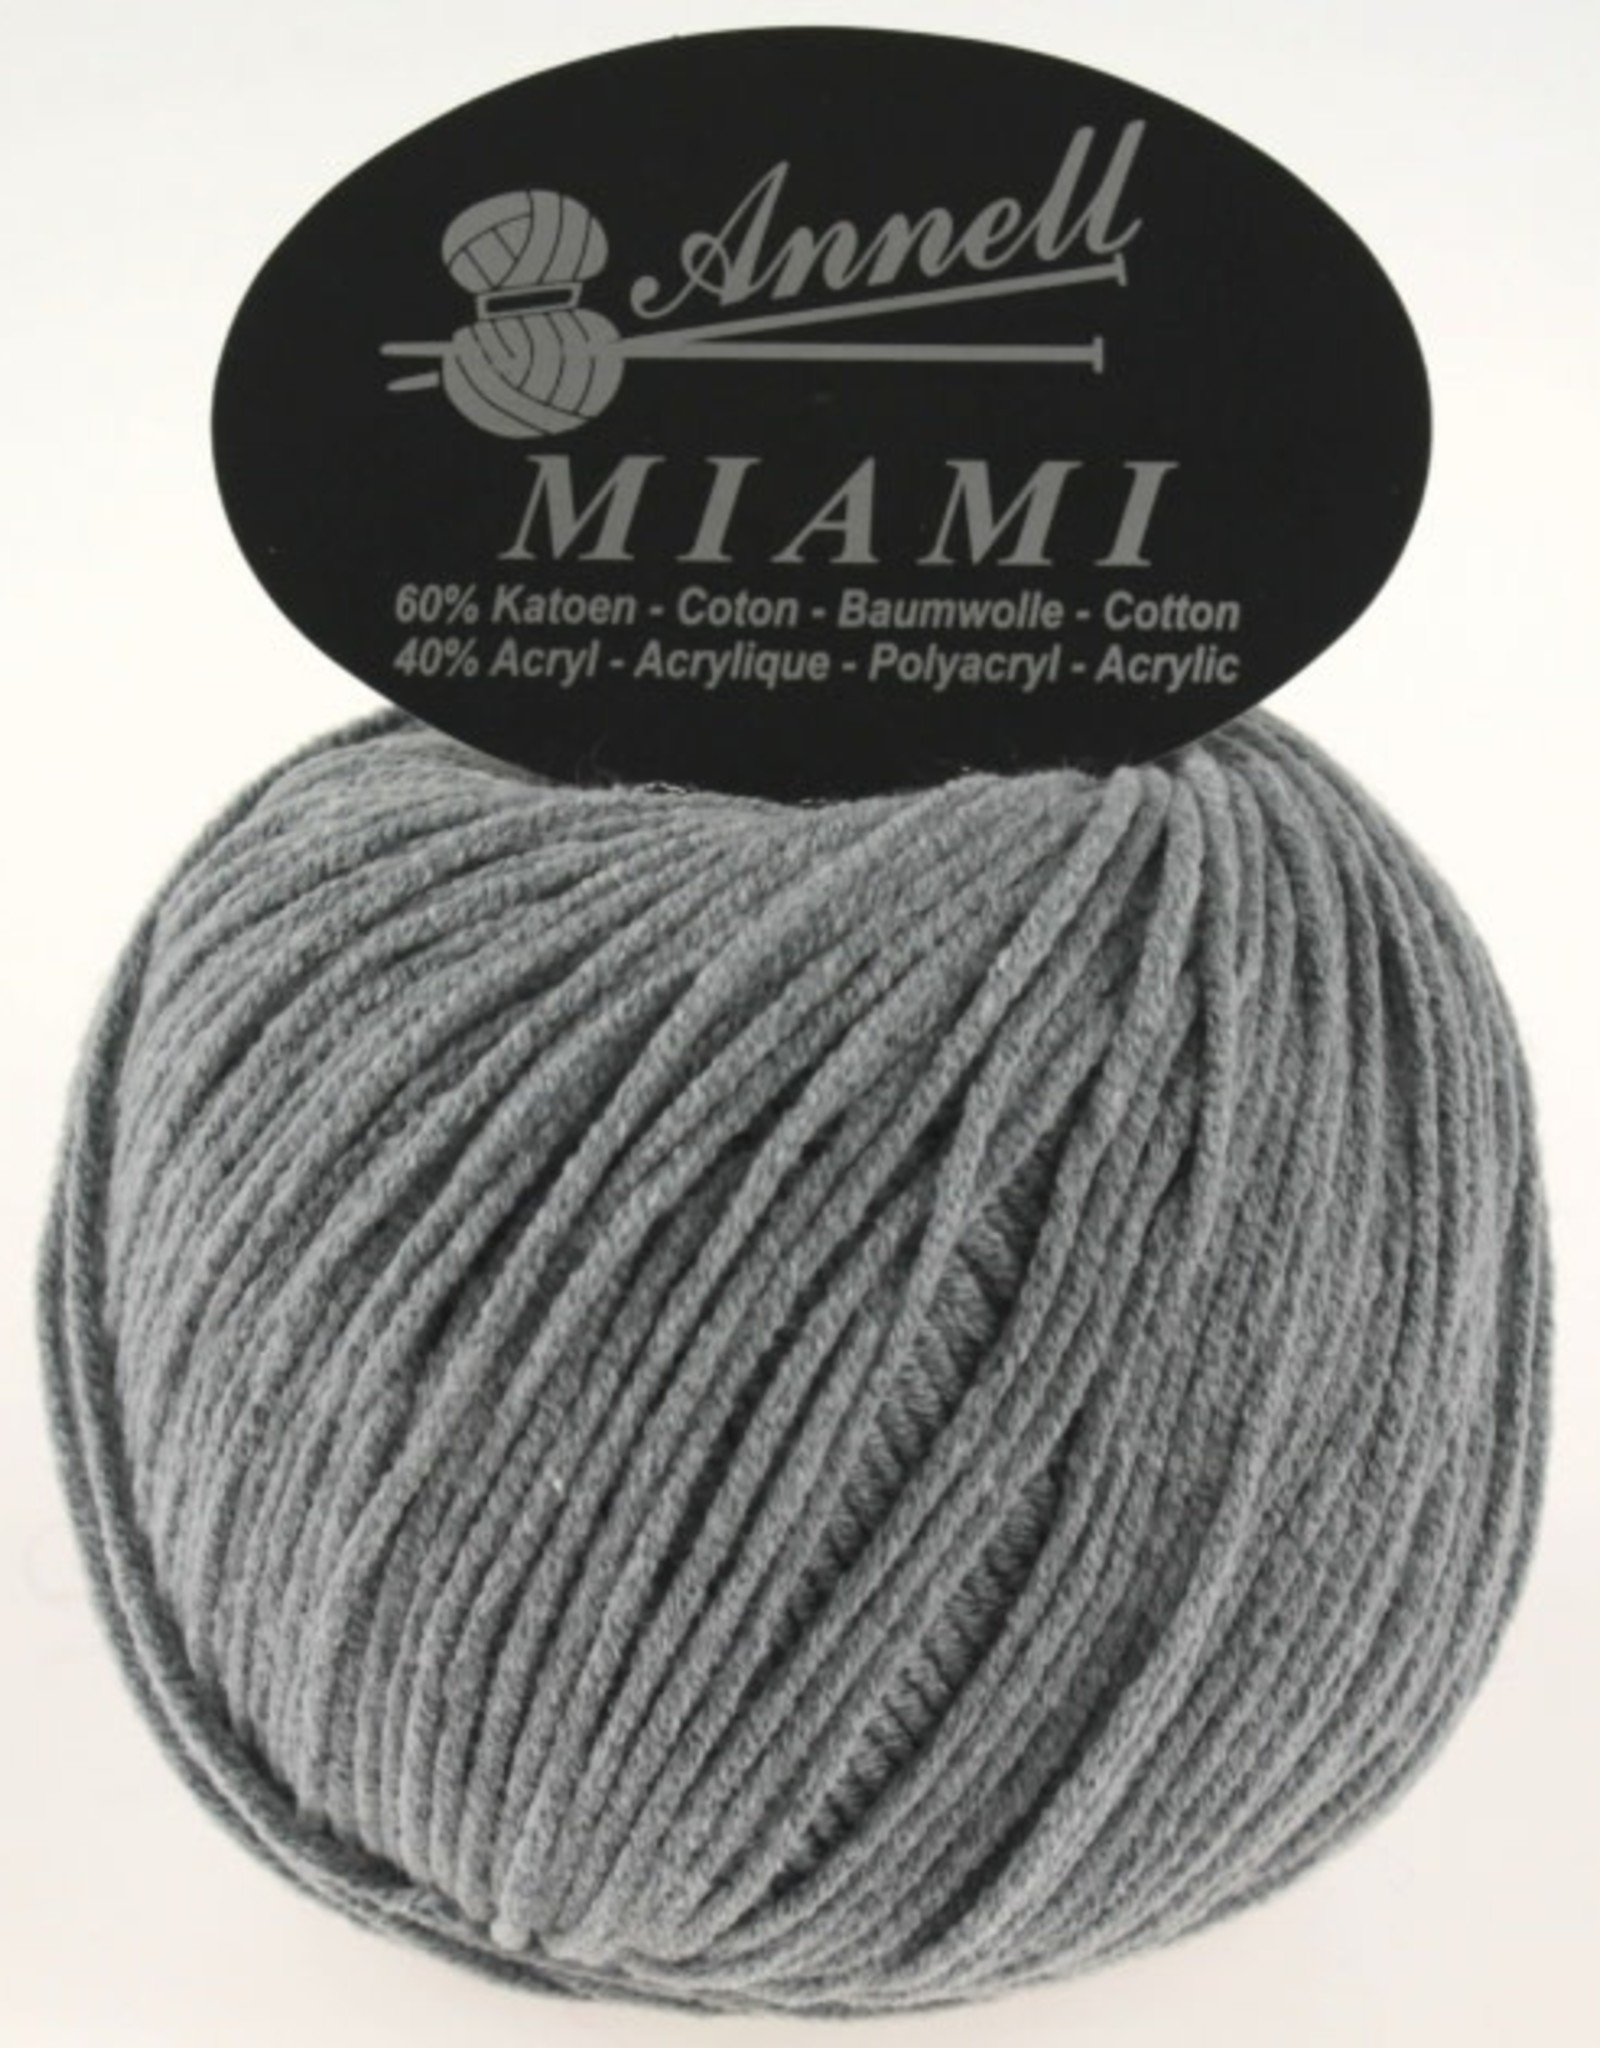 Annell Annell Miami 8957